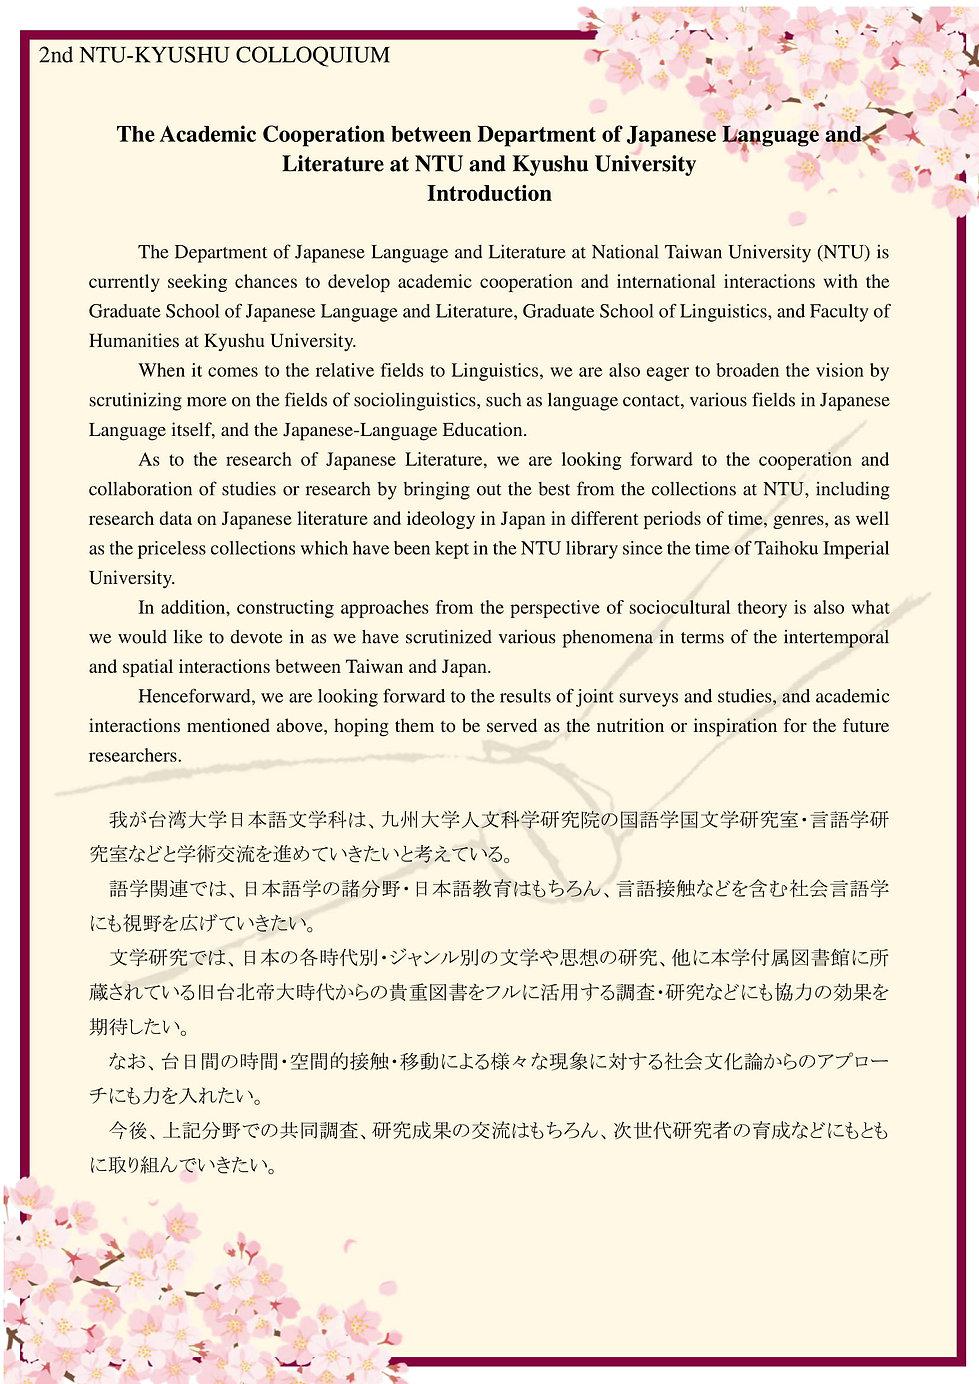 20200516收到_0527台大日文と九大との学術交流(英日提出版) 學術合作